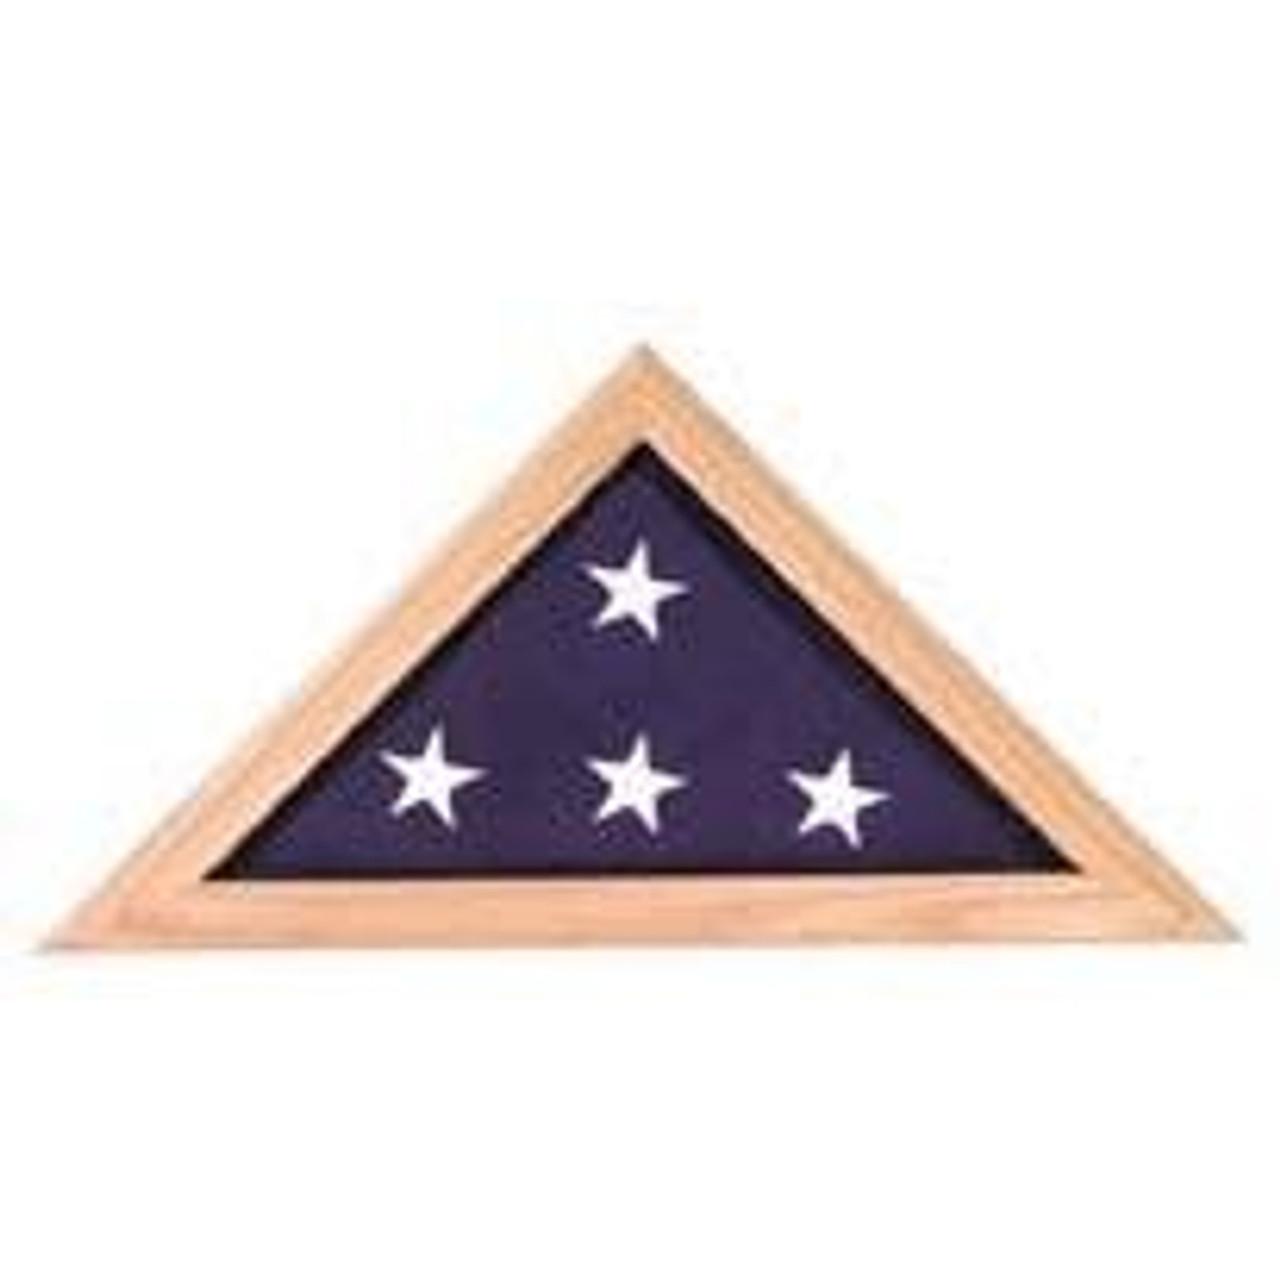 Oak finish flag case with folded American flag inside